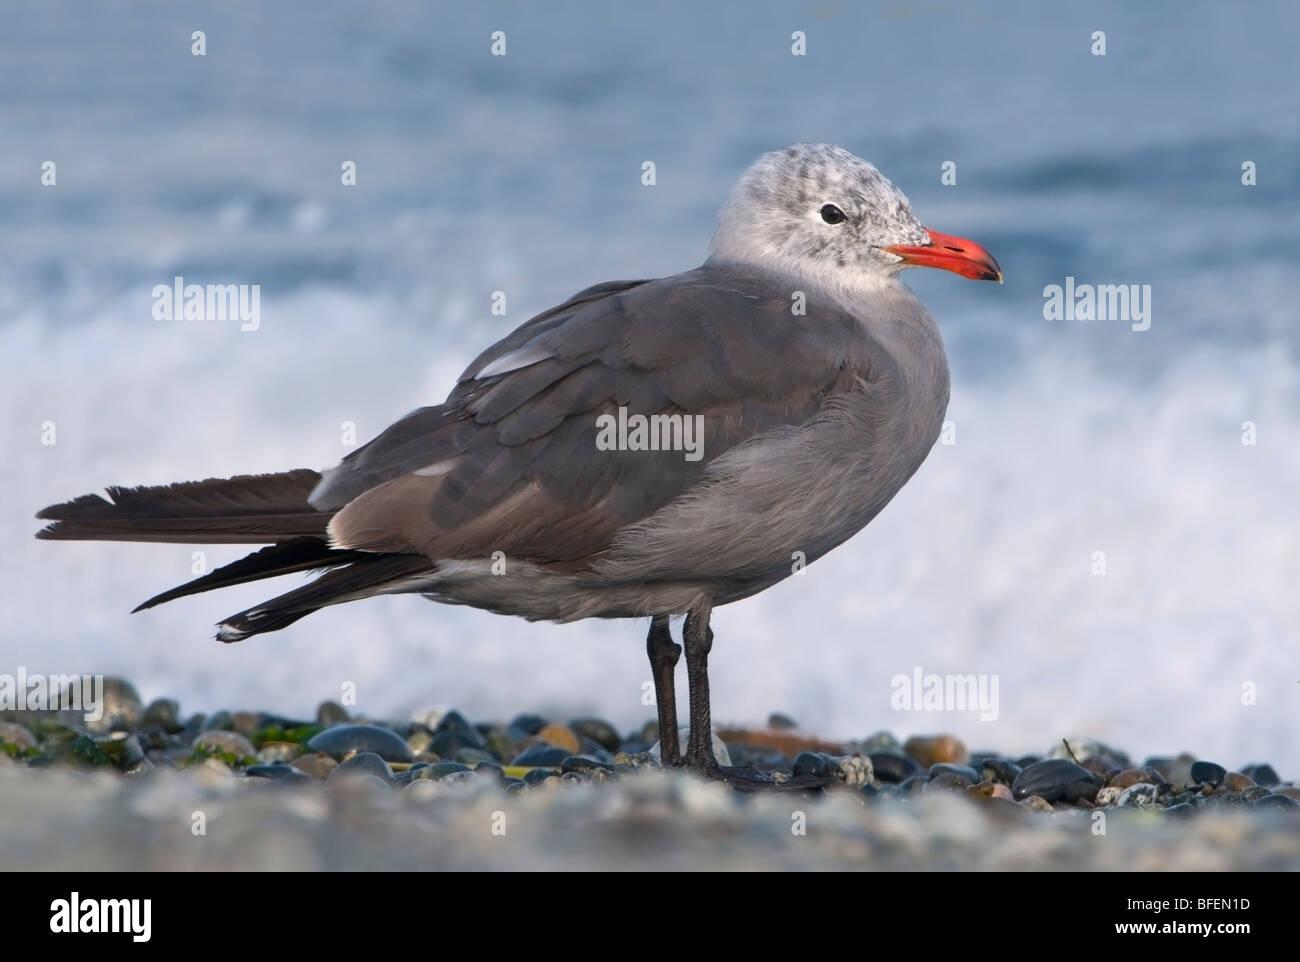 Heermann's gull (Larus heermanni) at Cordova Spit, Saanichton, Vancouver Island, British Columbia, Canada - Stock Image